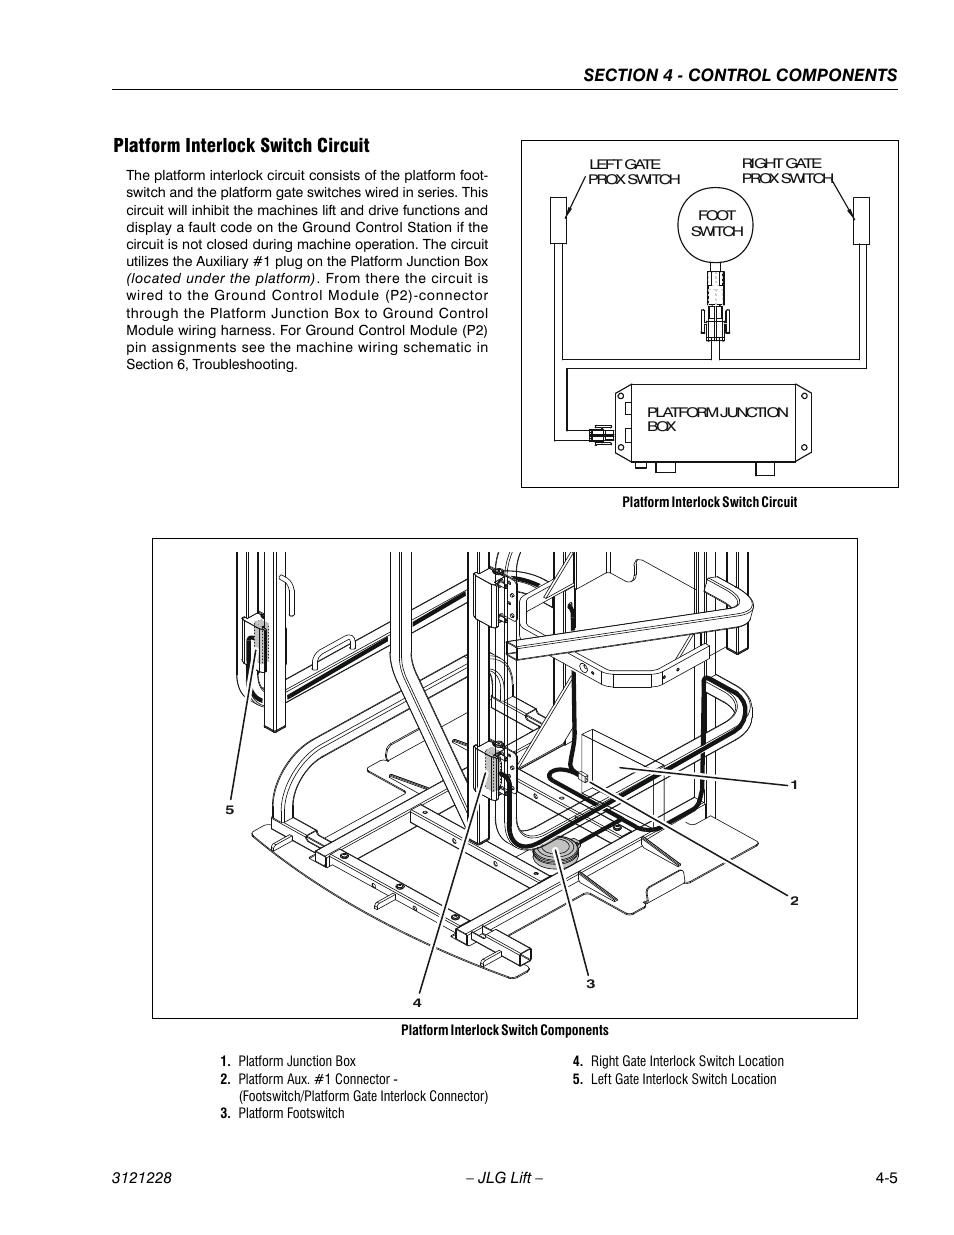 Platform interlock switch circuit, Platform interlock